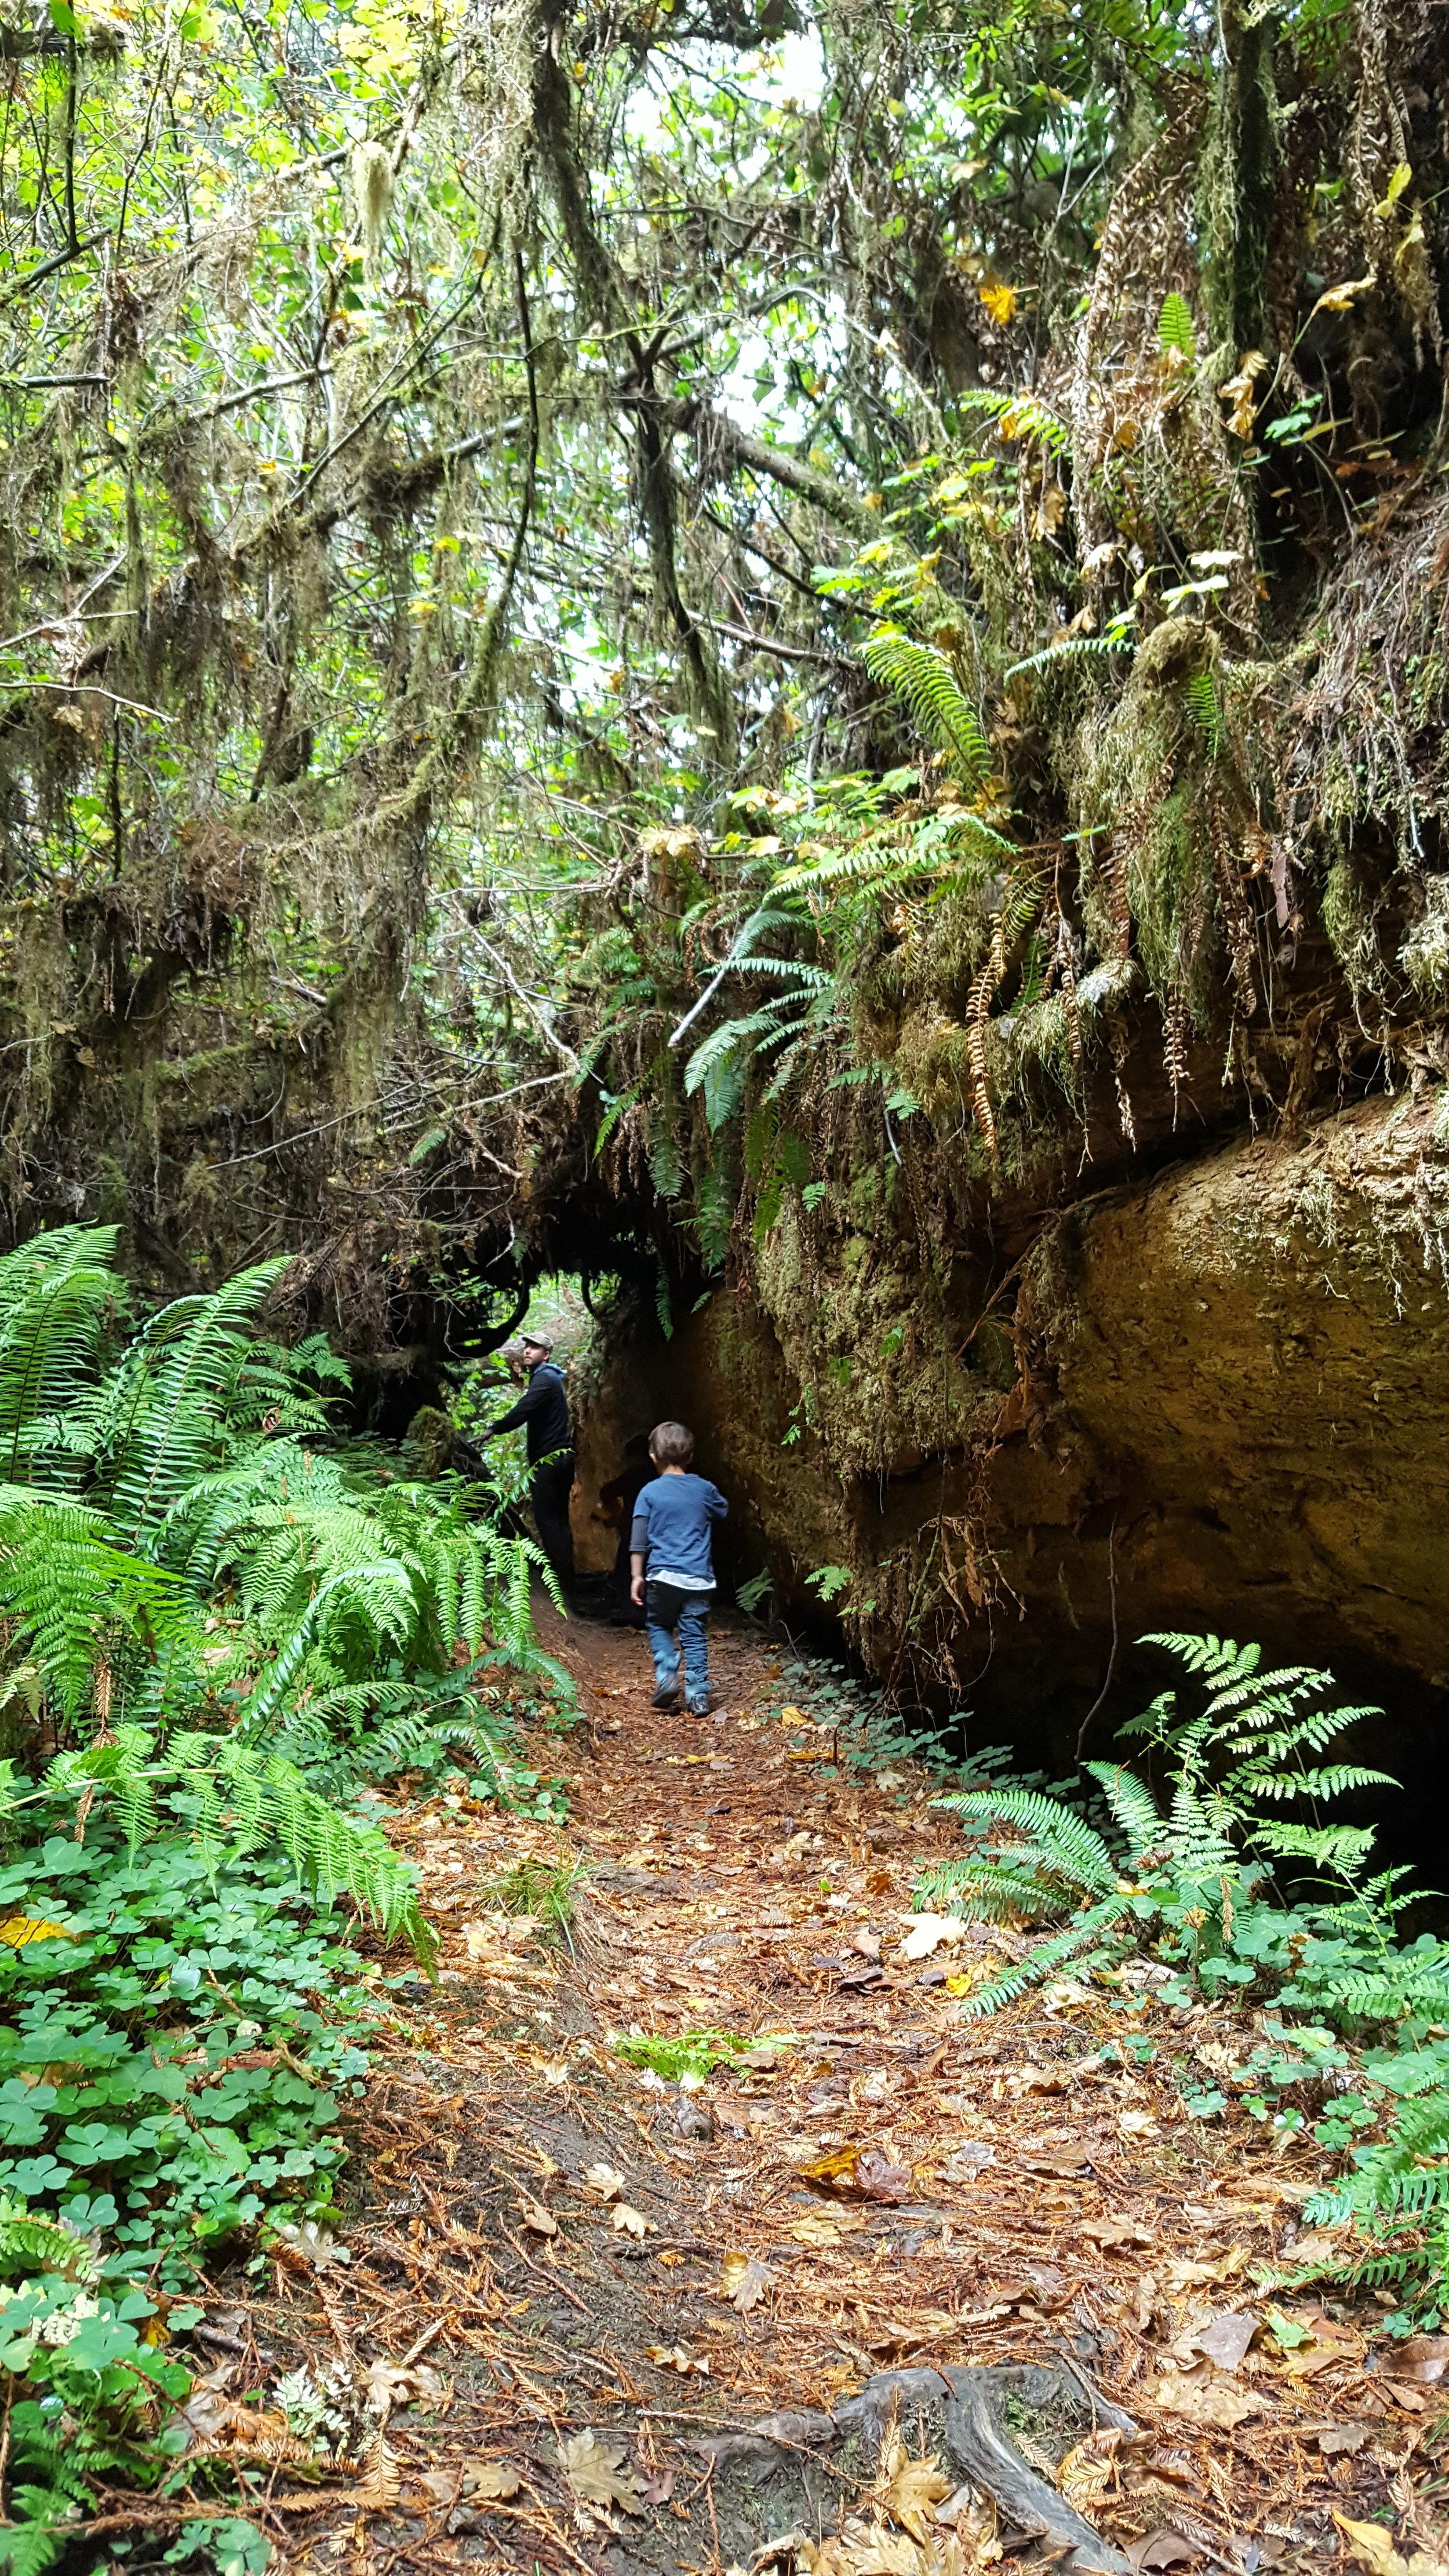 Hiking beside a giant fallen redwood.